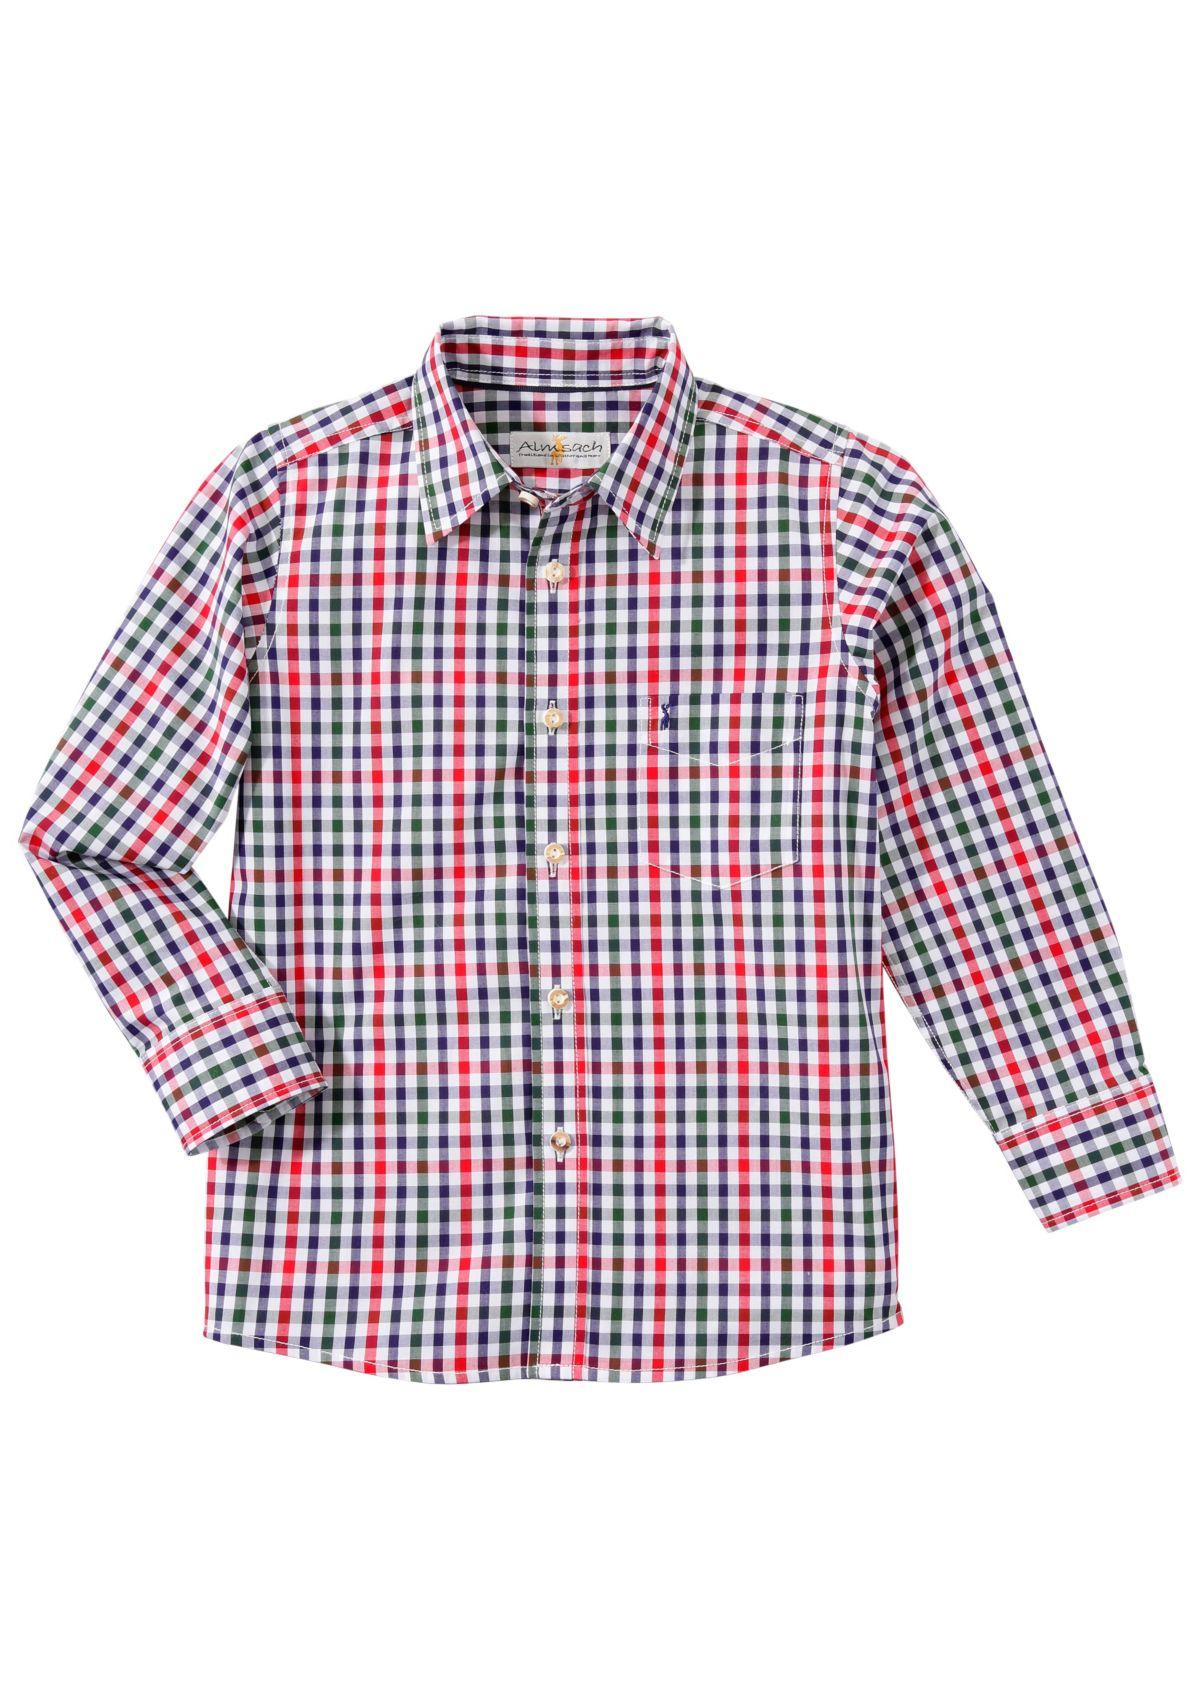 Almsach Trachtenhemd Kinder im Karomuster